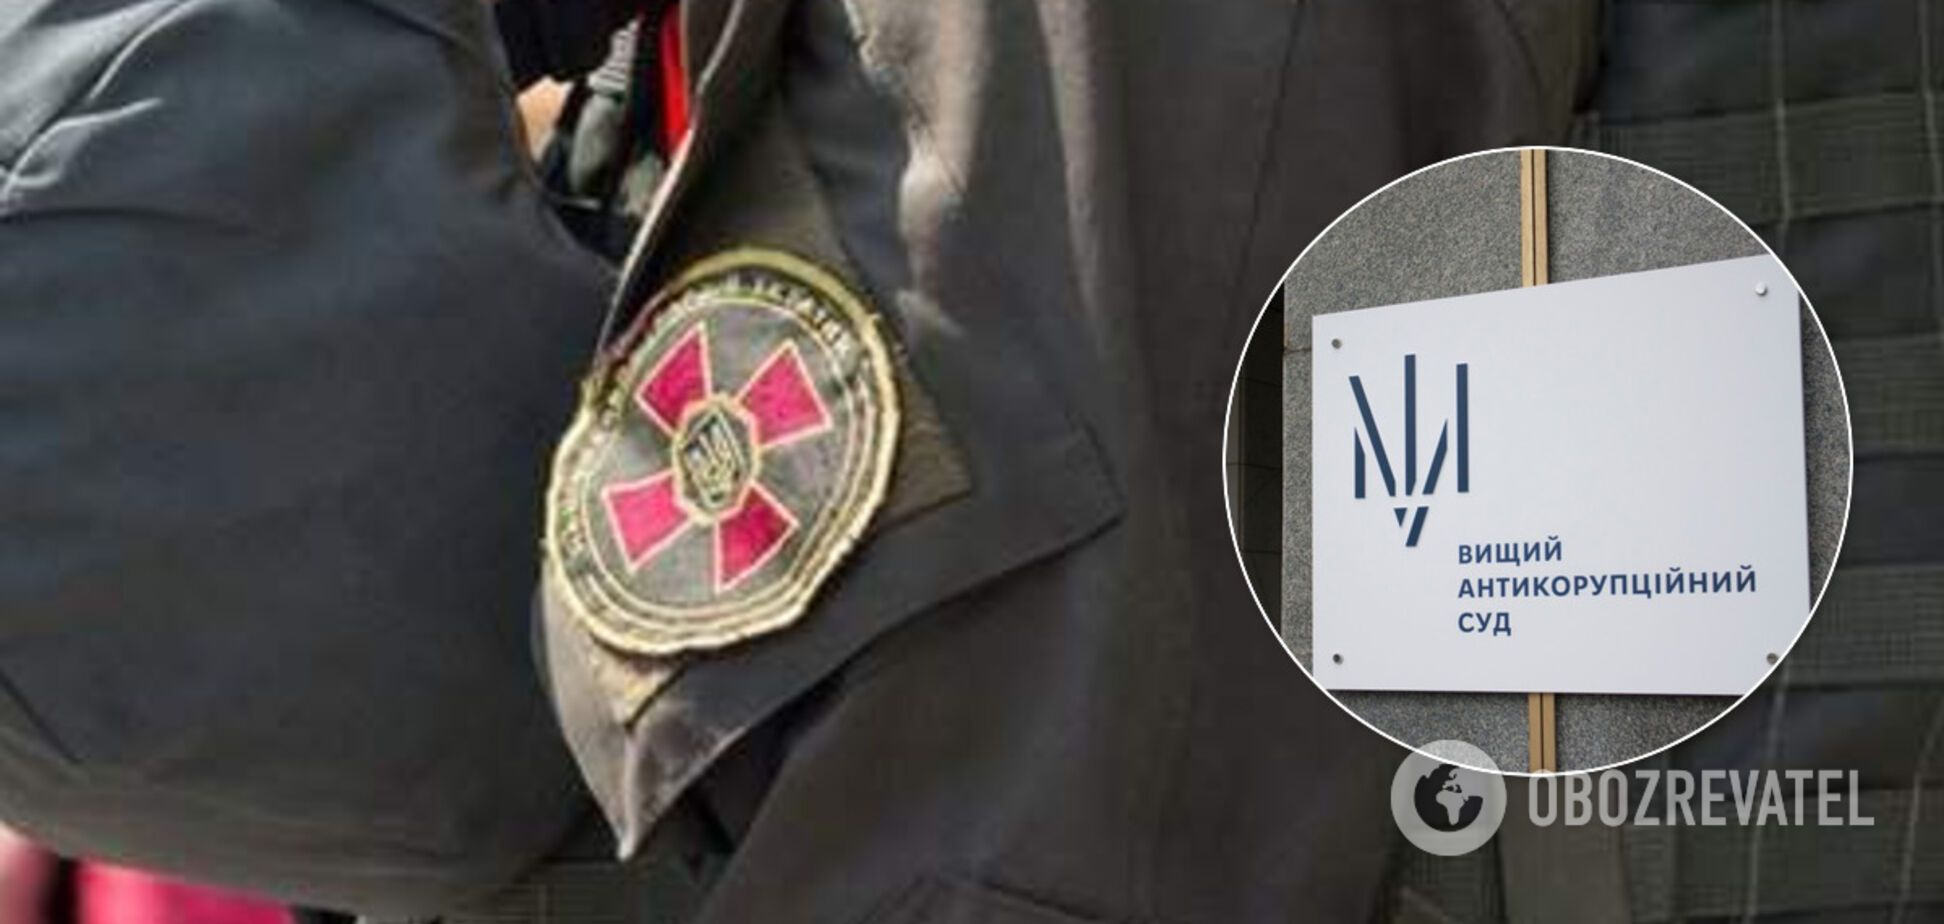 Фигуранту дела о хищении имущества Нацгвардии увеличили залог до 3 млн грн